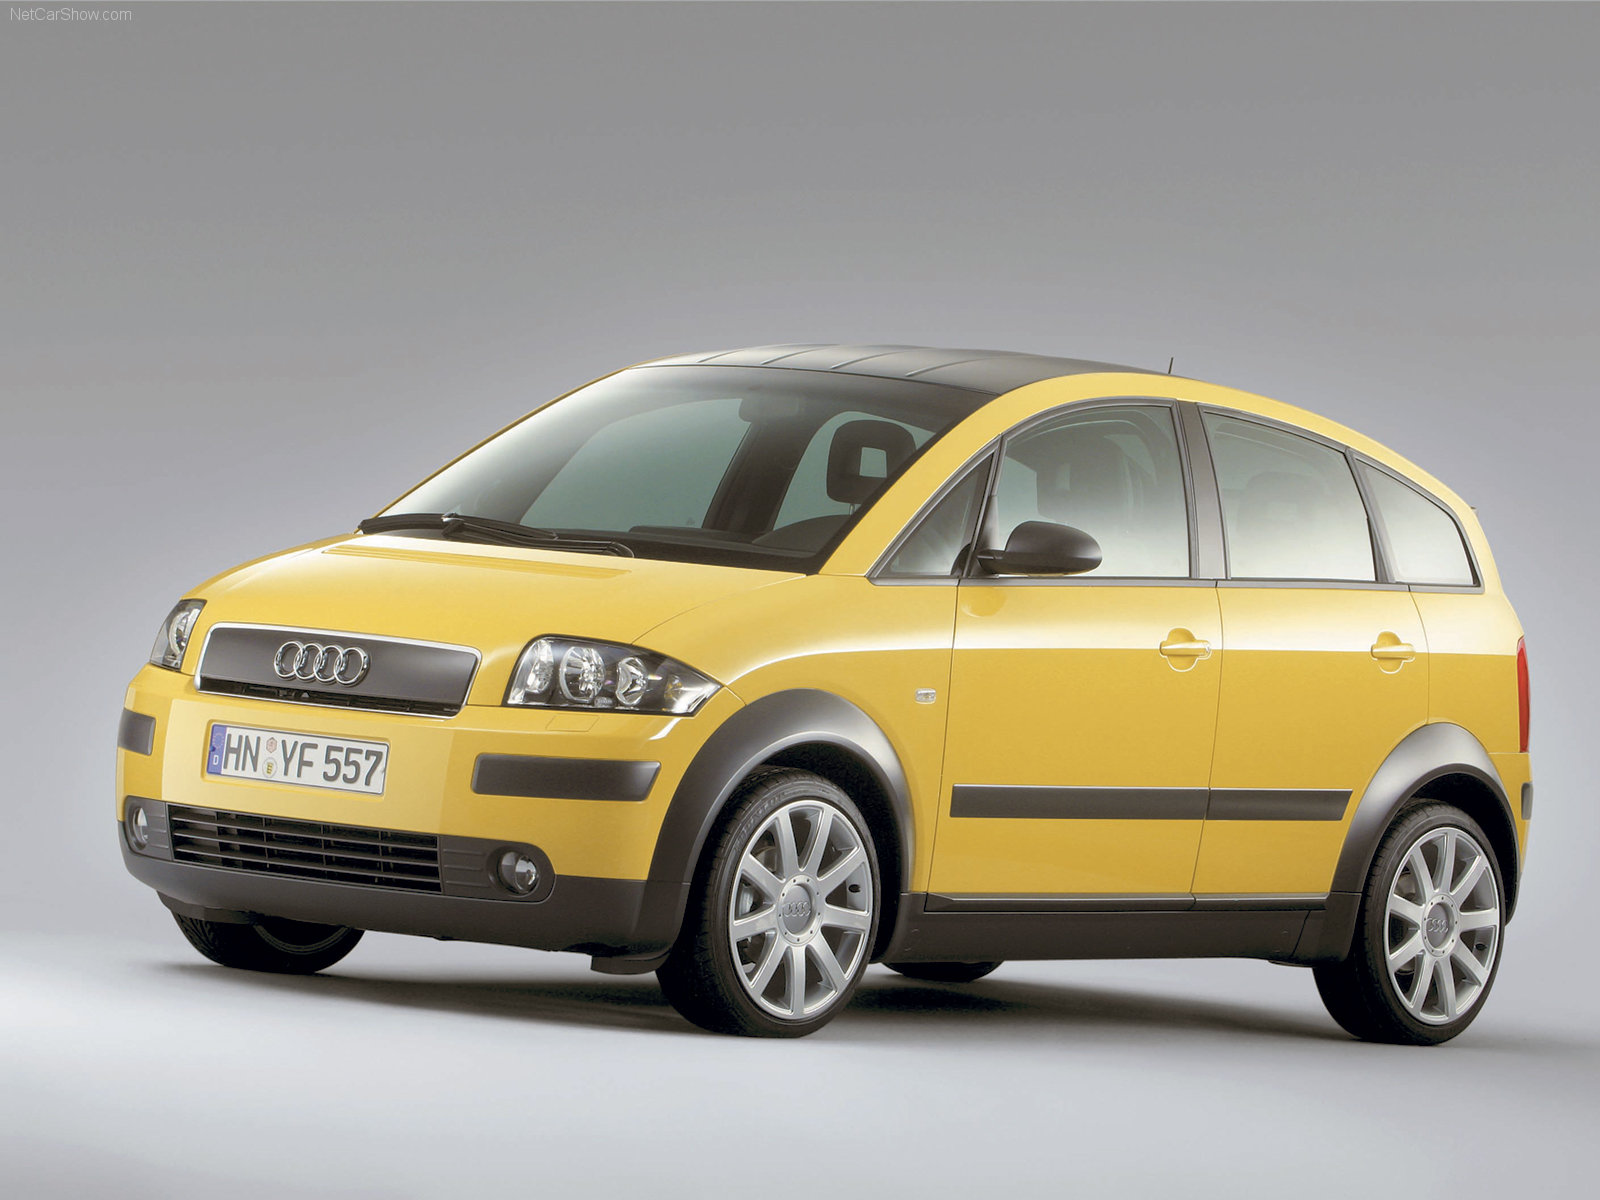 Audi-A2_2003_1600x1200_wallpaper_08.jpg.6a4a3490f1628404ccf0b4965bc9420d.jpg